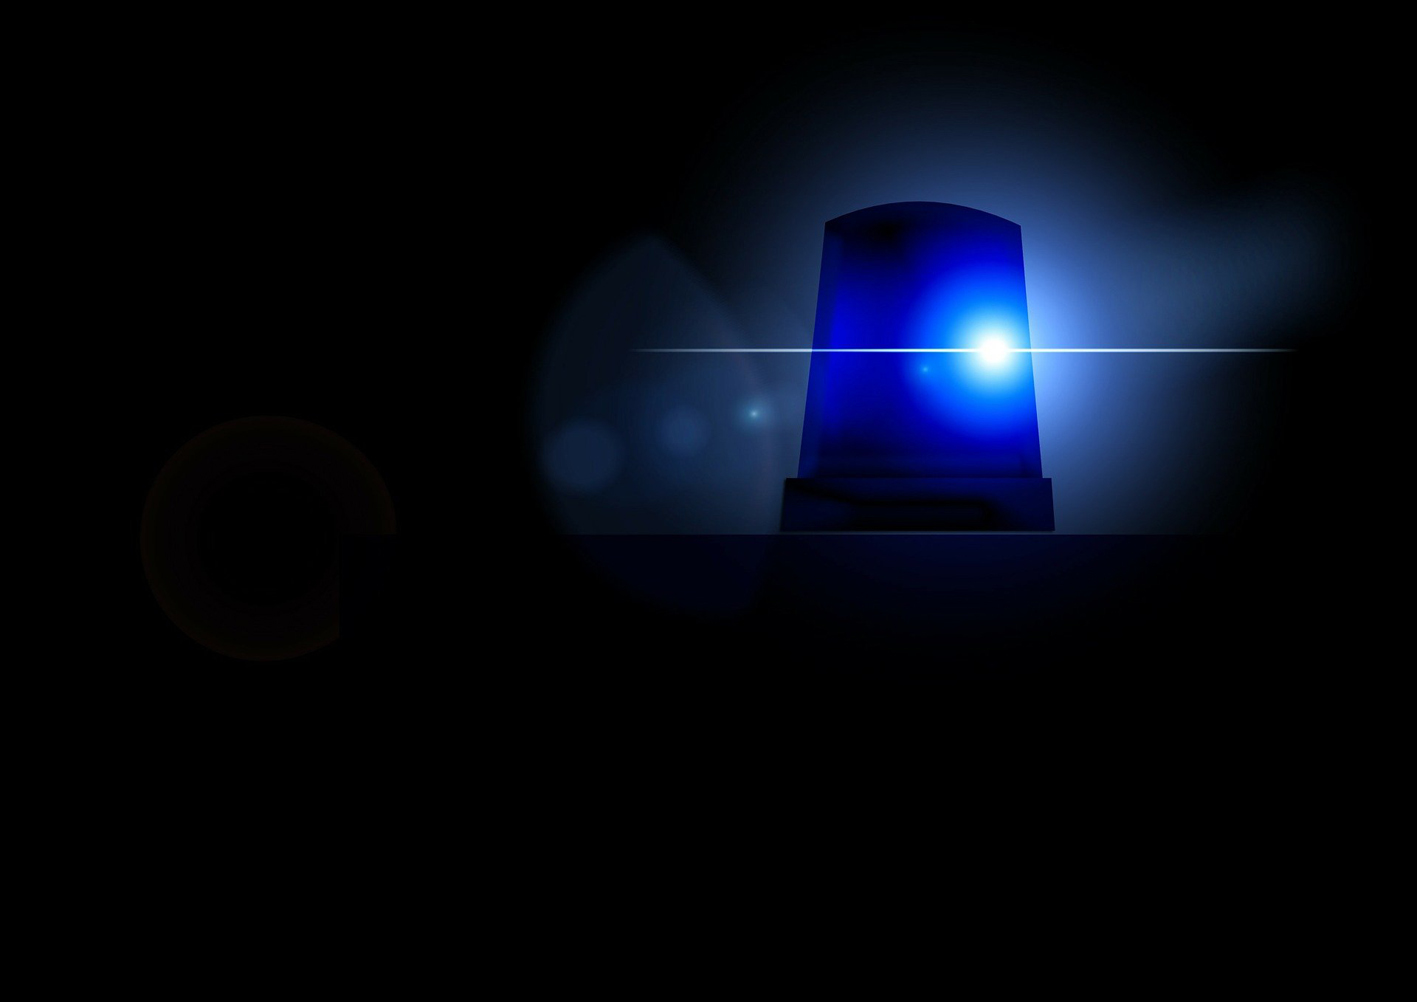 2020 11 09 aoelfb blaulicht notfall